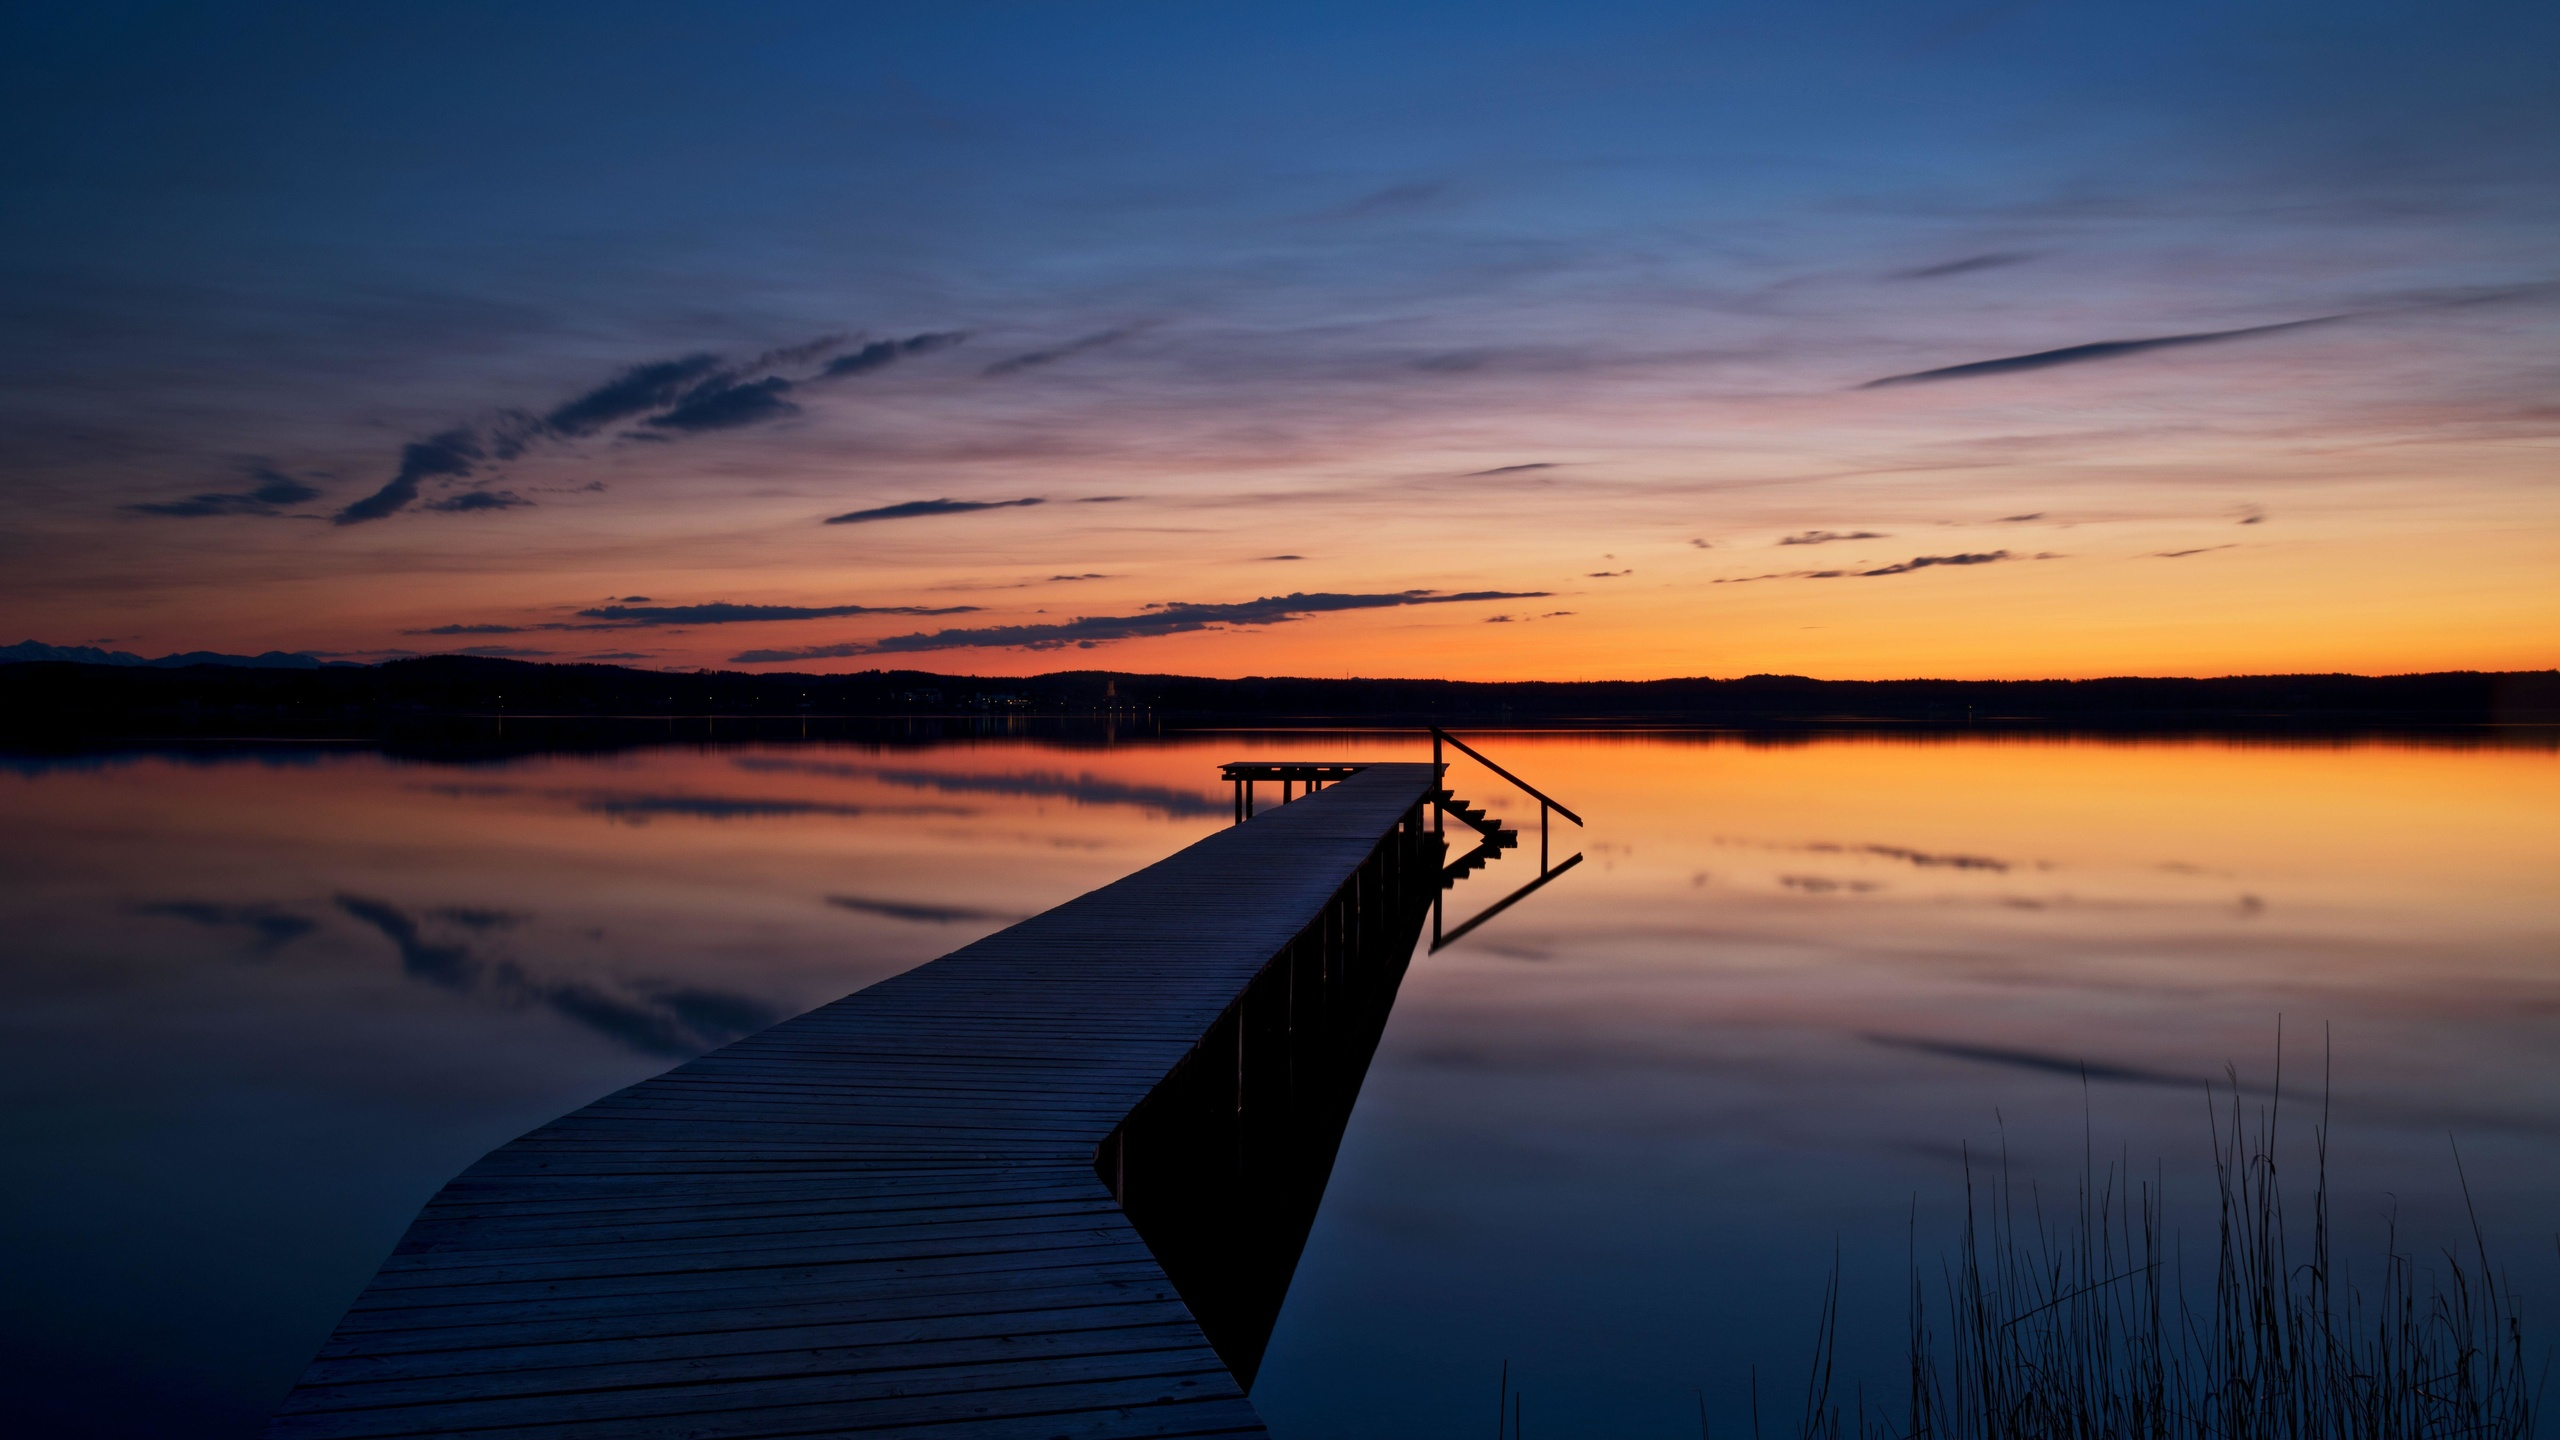 закат, мост, пирс, горизонт